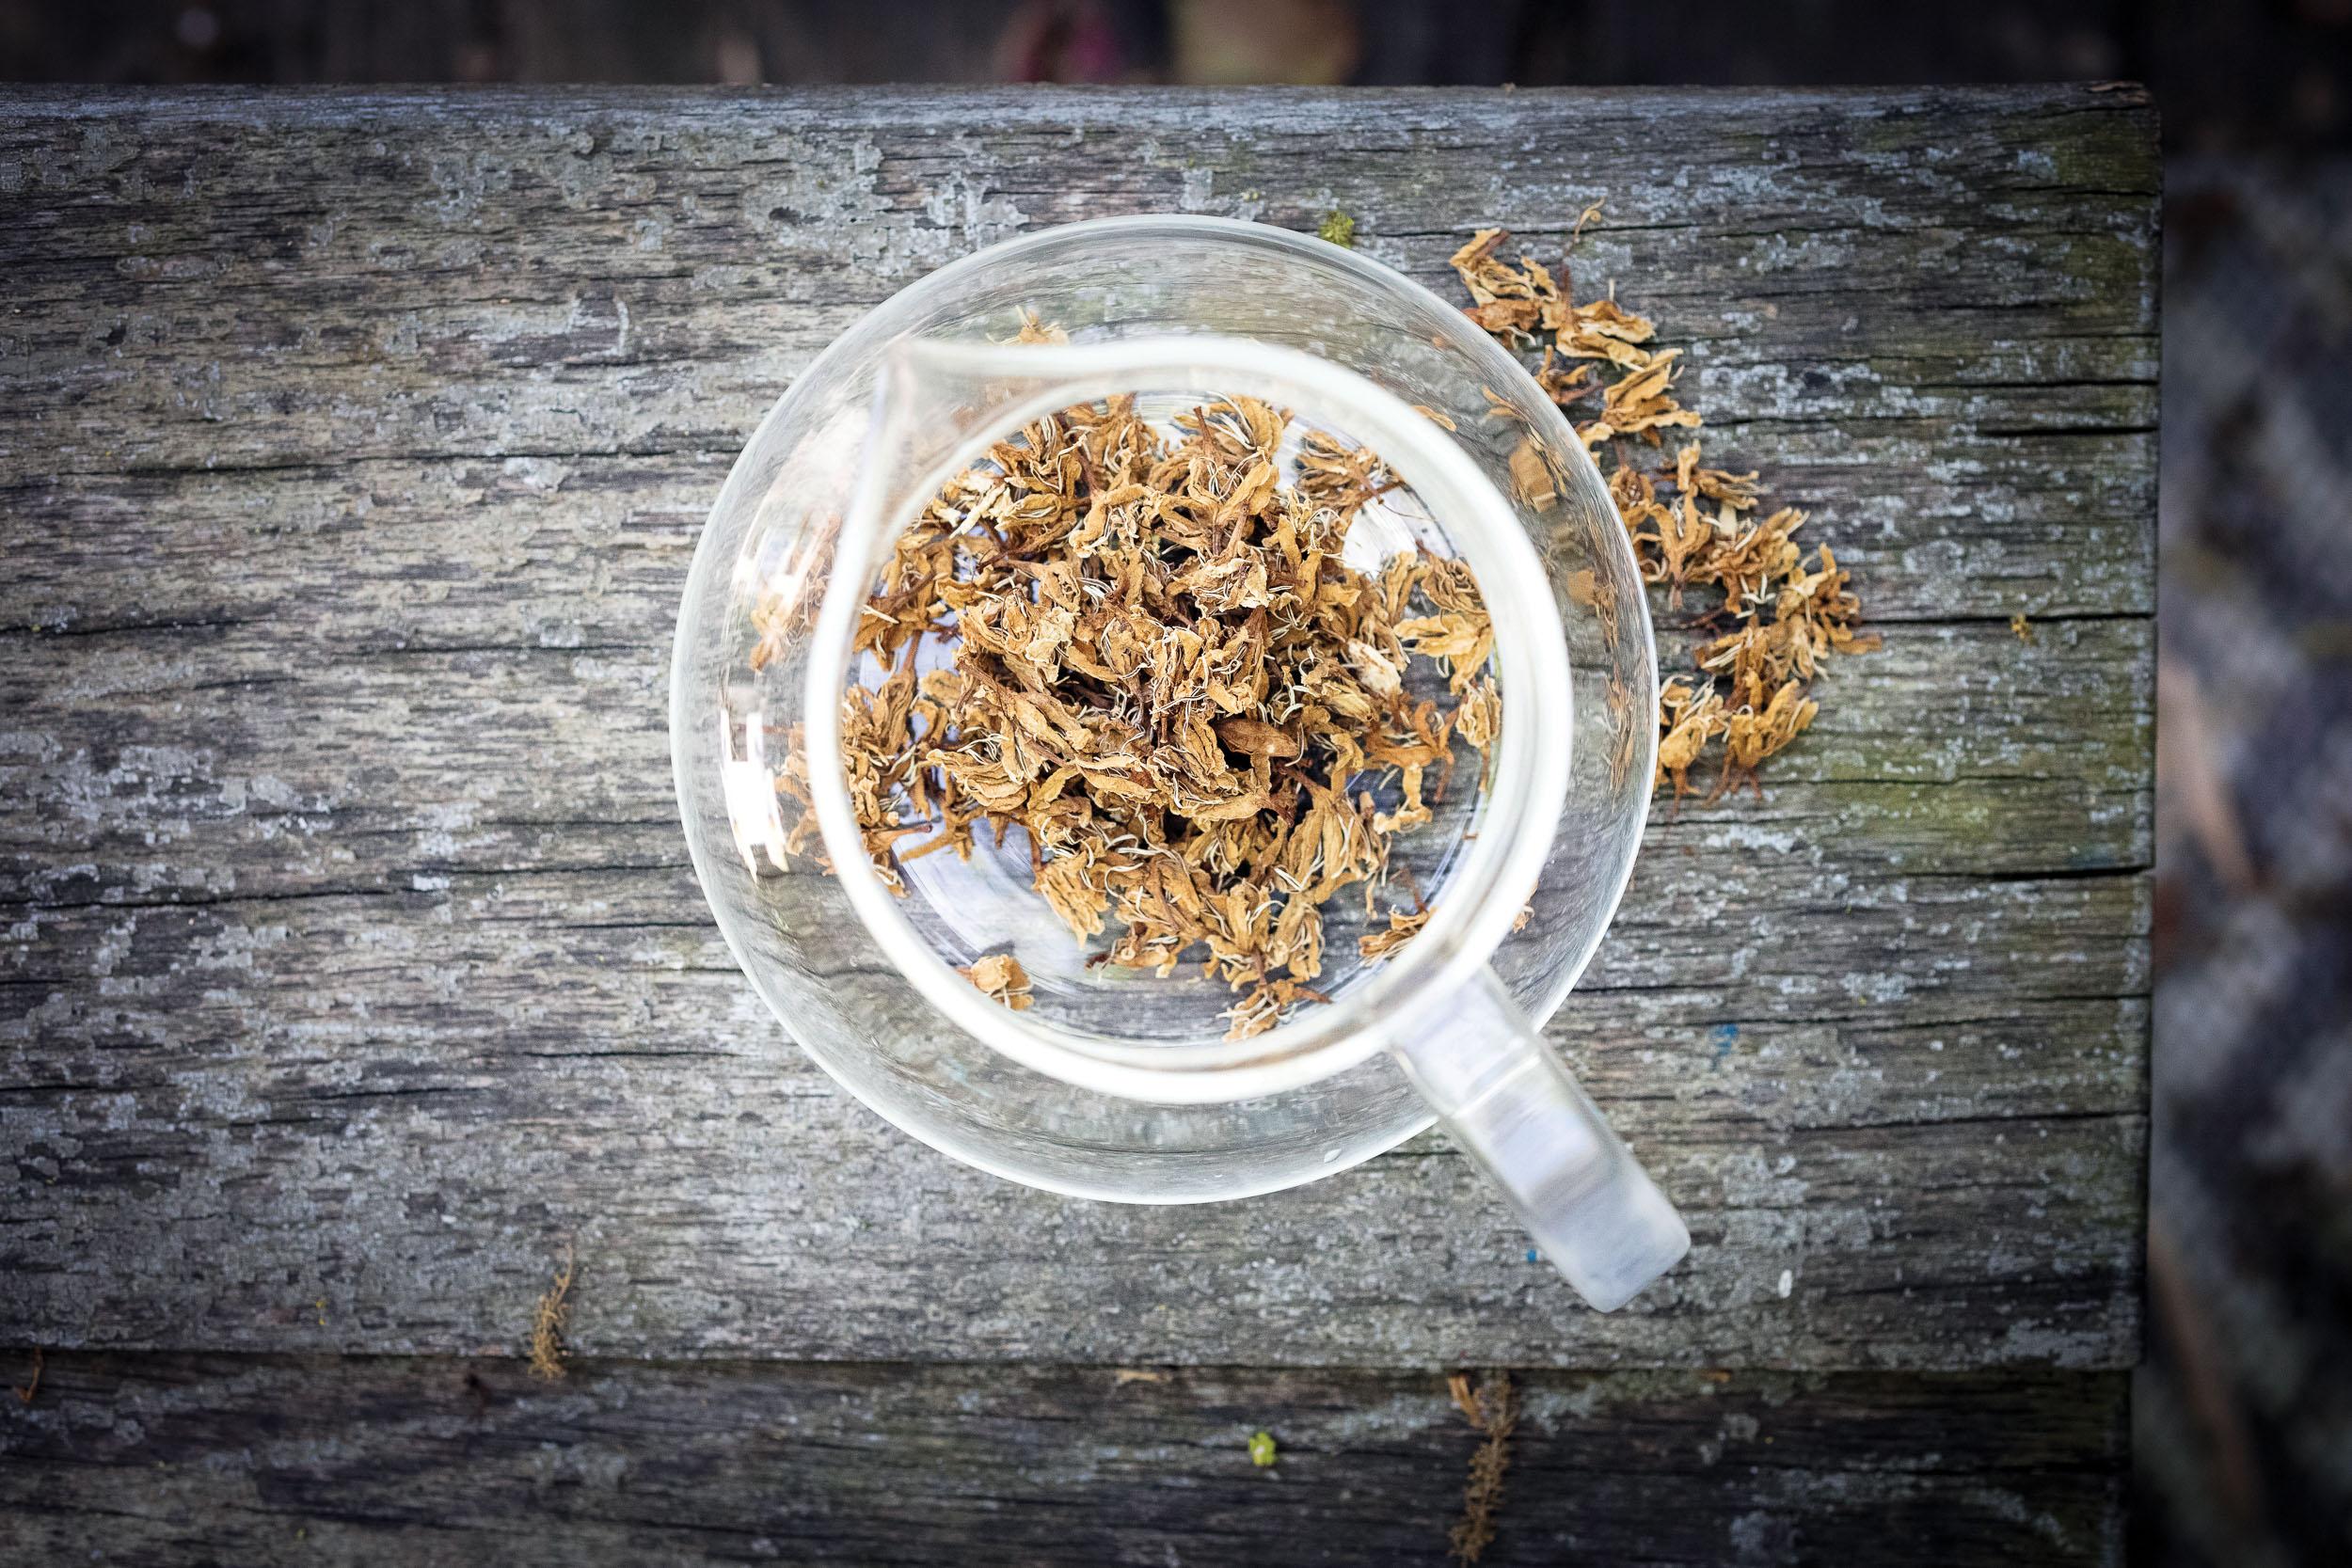 Flor de Cafe, or coffee blossoms to steep as tea